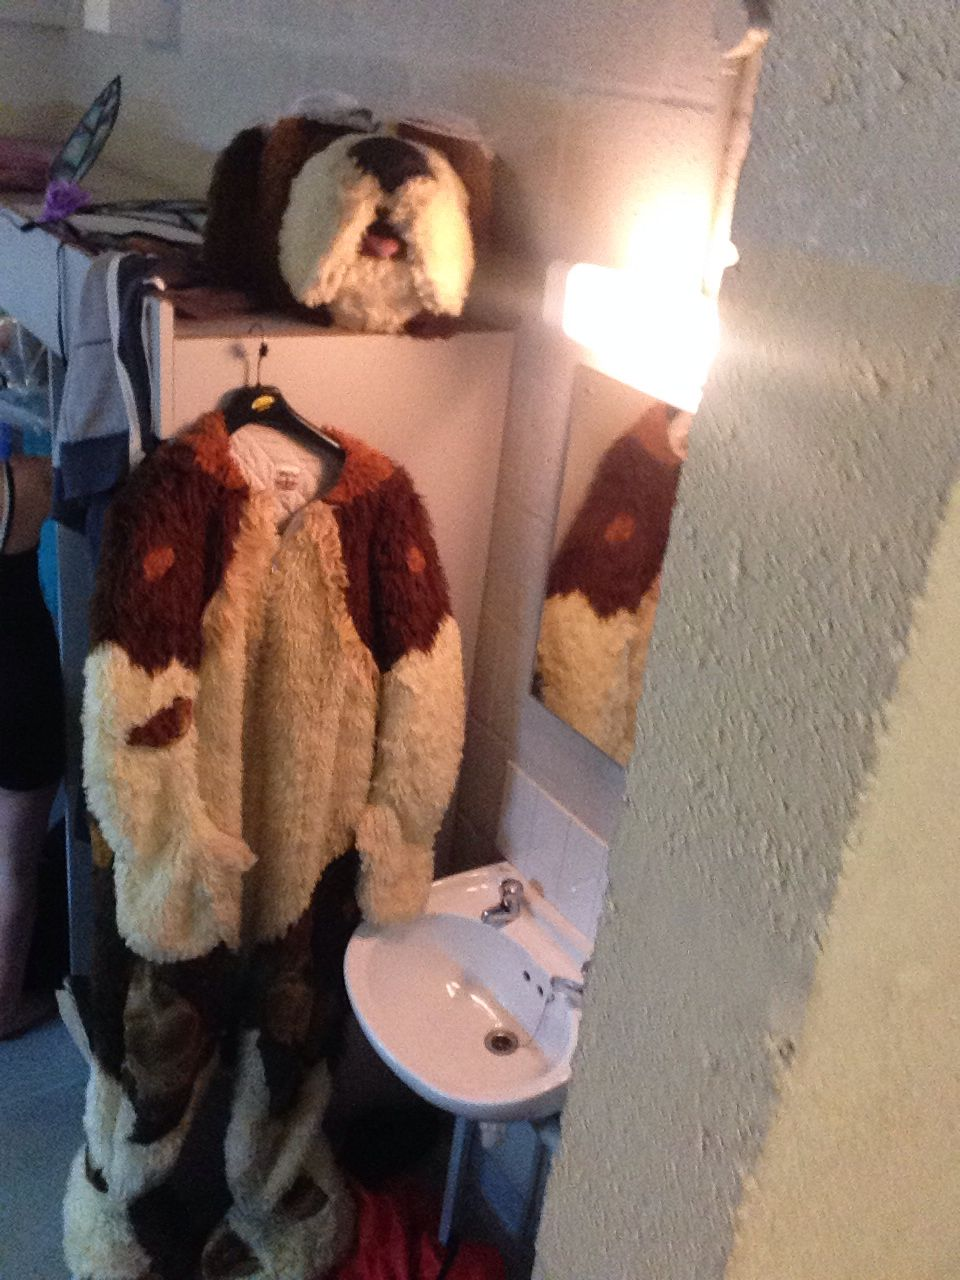 My nana the dog costume x | Peter Pan the musical 2014 ...